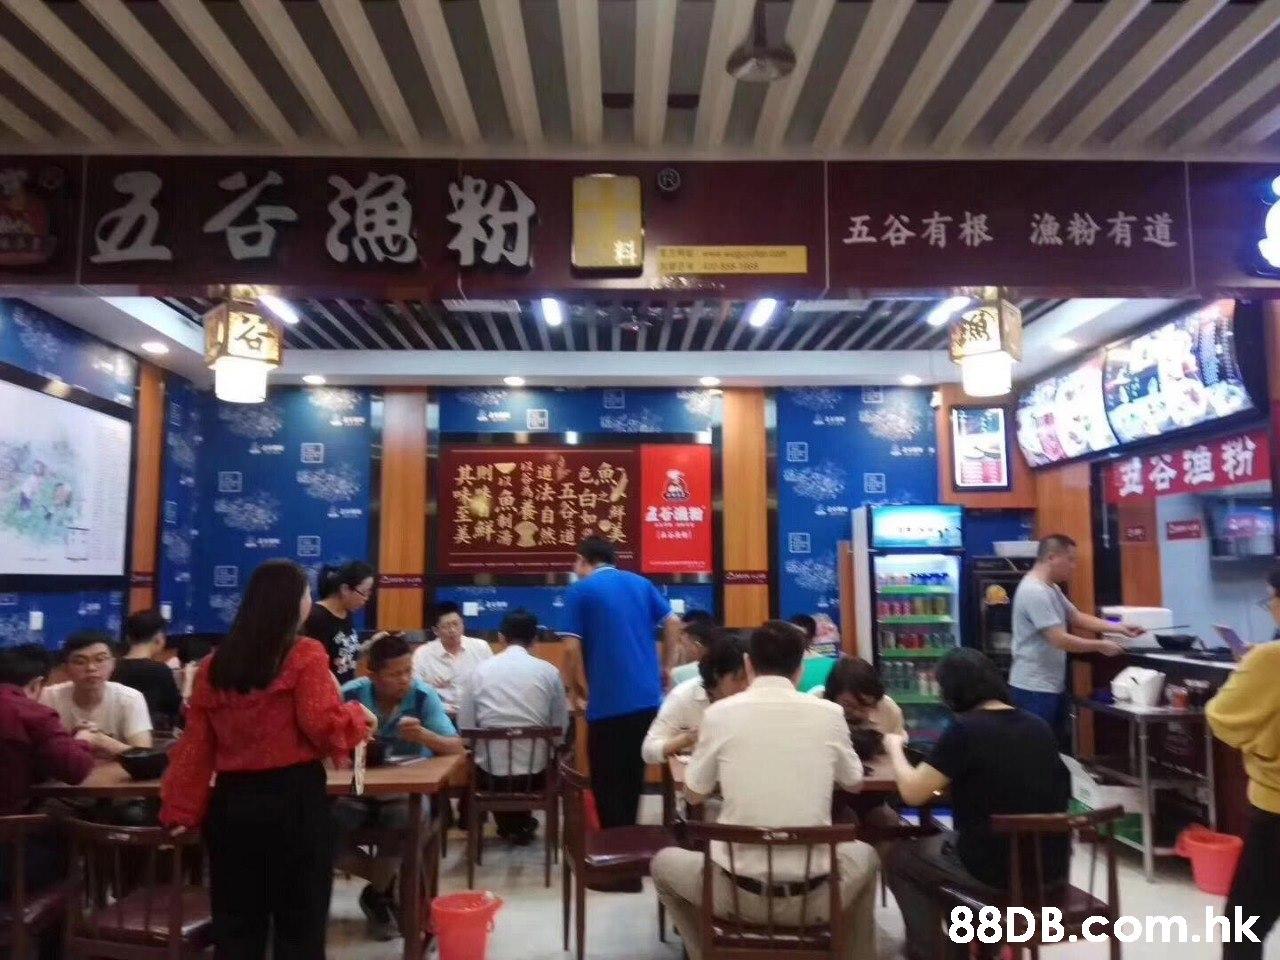 五否漁粉■ 五谷有根 漁粉有道 E 灵谷演粉 .hk,Food court,Fast food restaurant,Building,